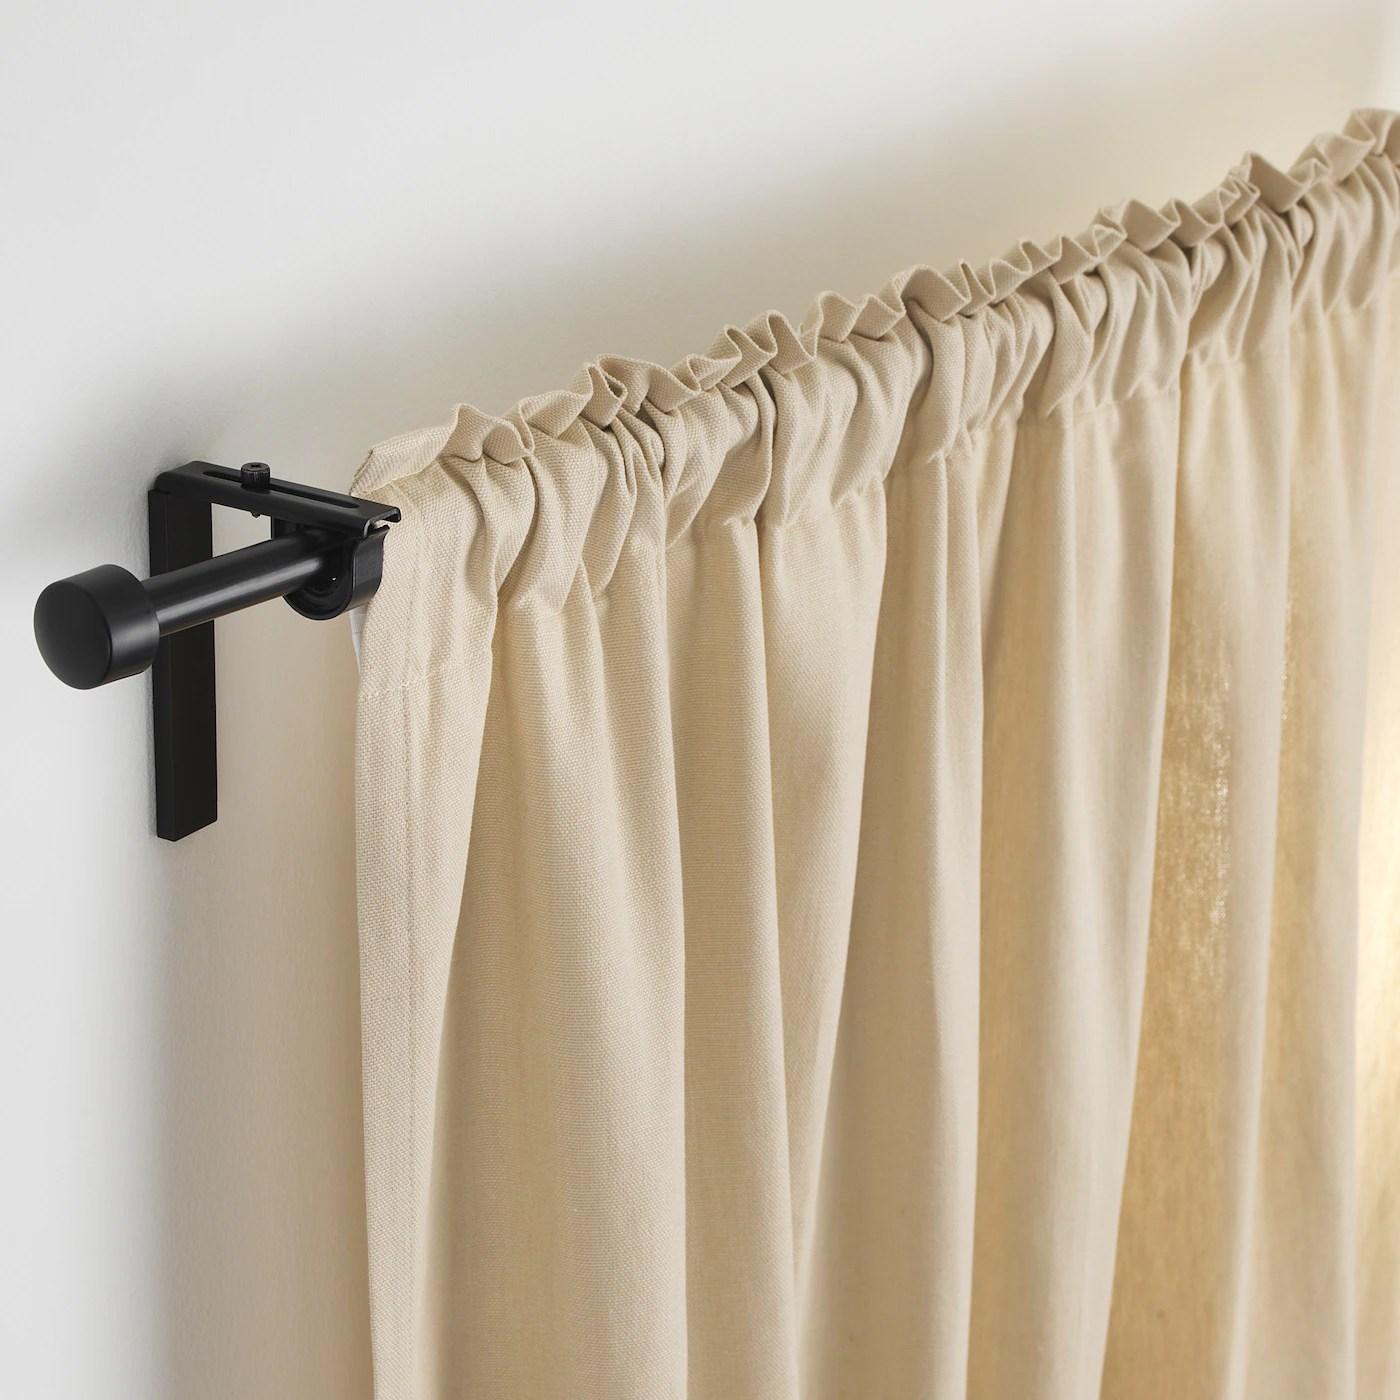 racka curtain rod combination black 47 1 4 82 5 8